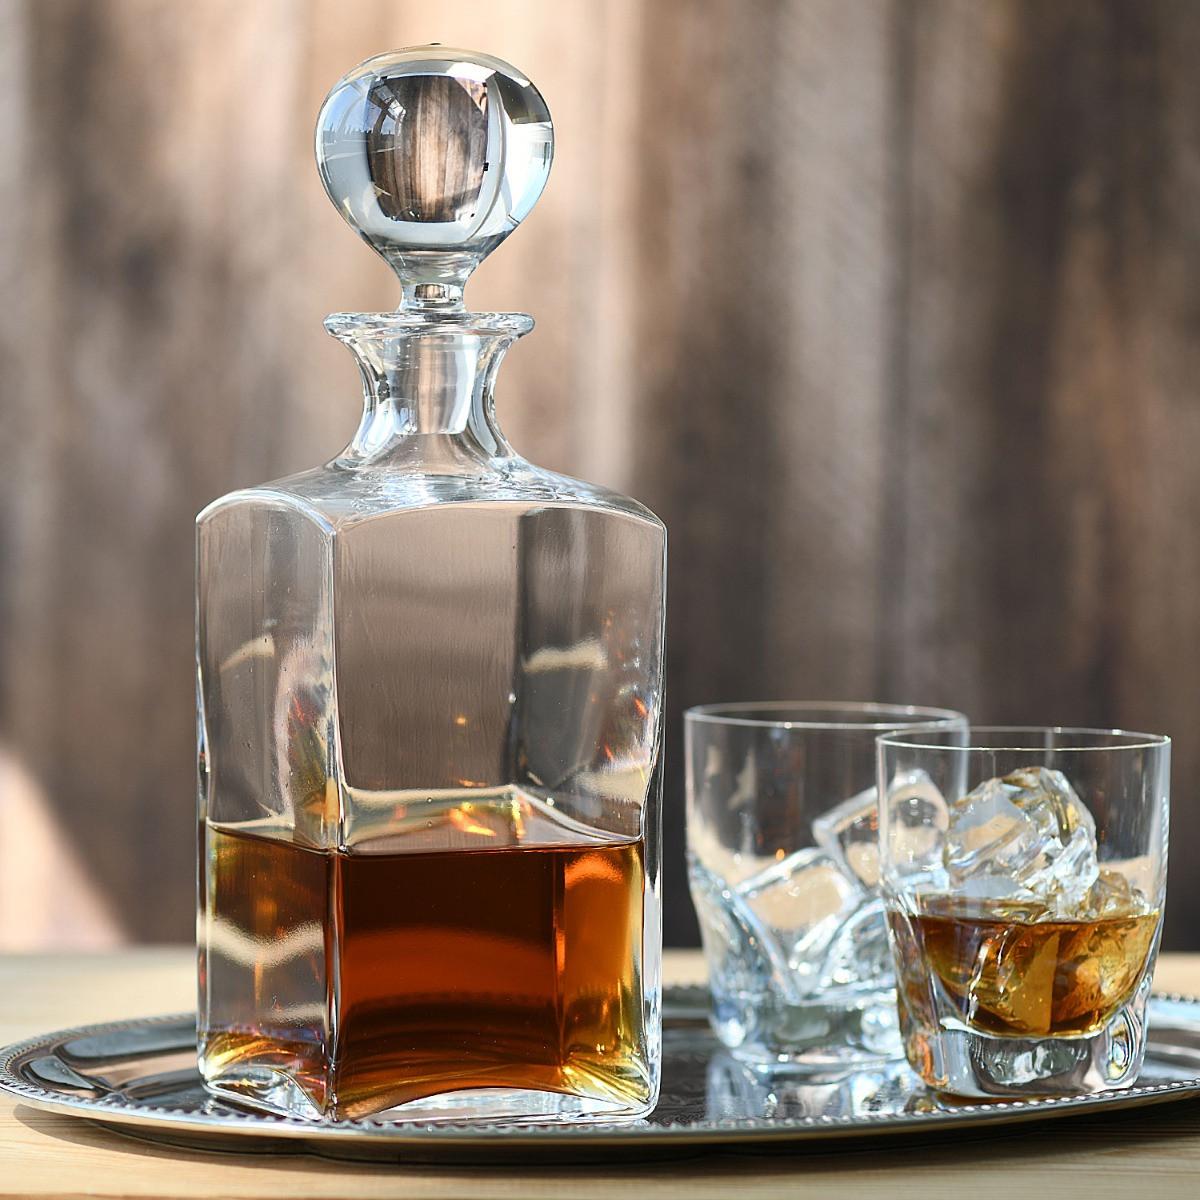 Historia Rodzaje Whisky Whiskey Oraz Sposoby Jej Serwowania Blog E Sklep Krosno Glass S A